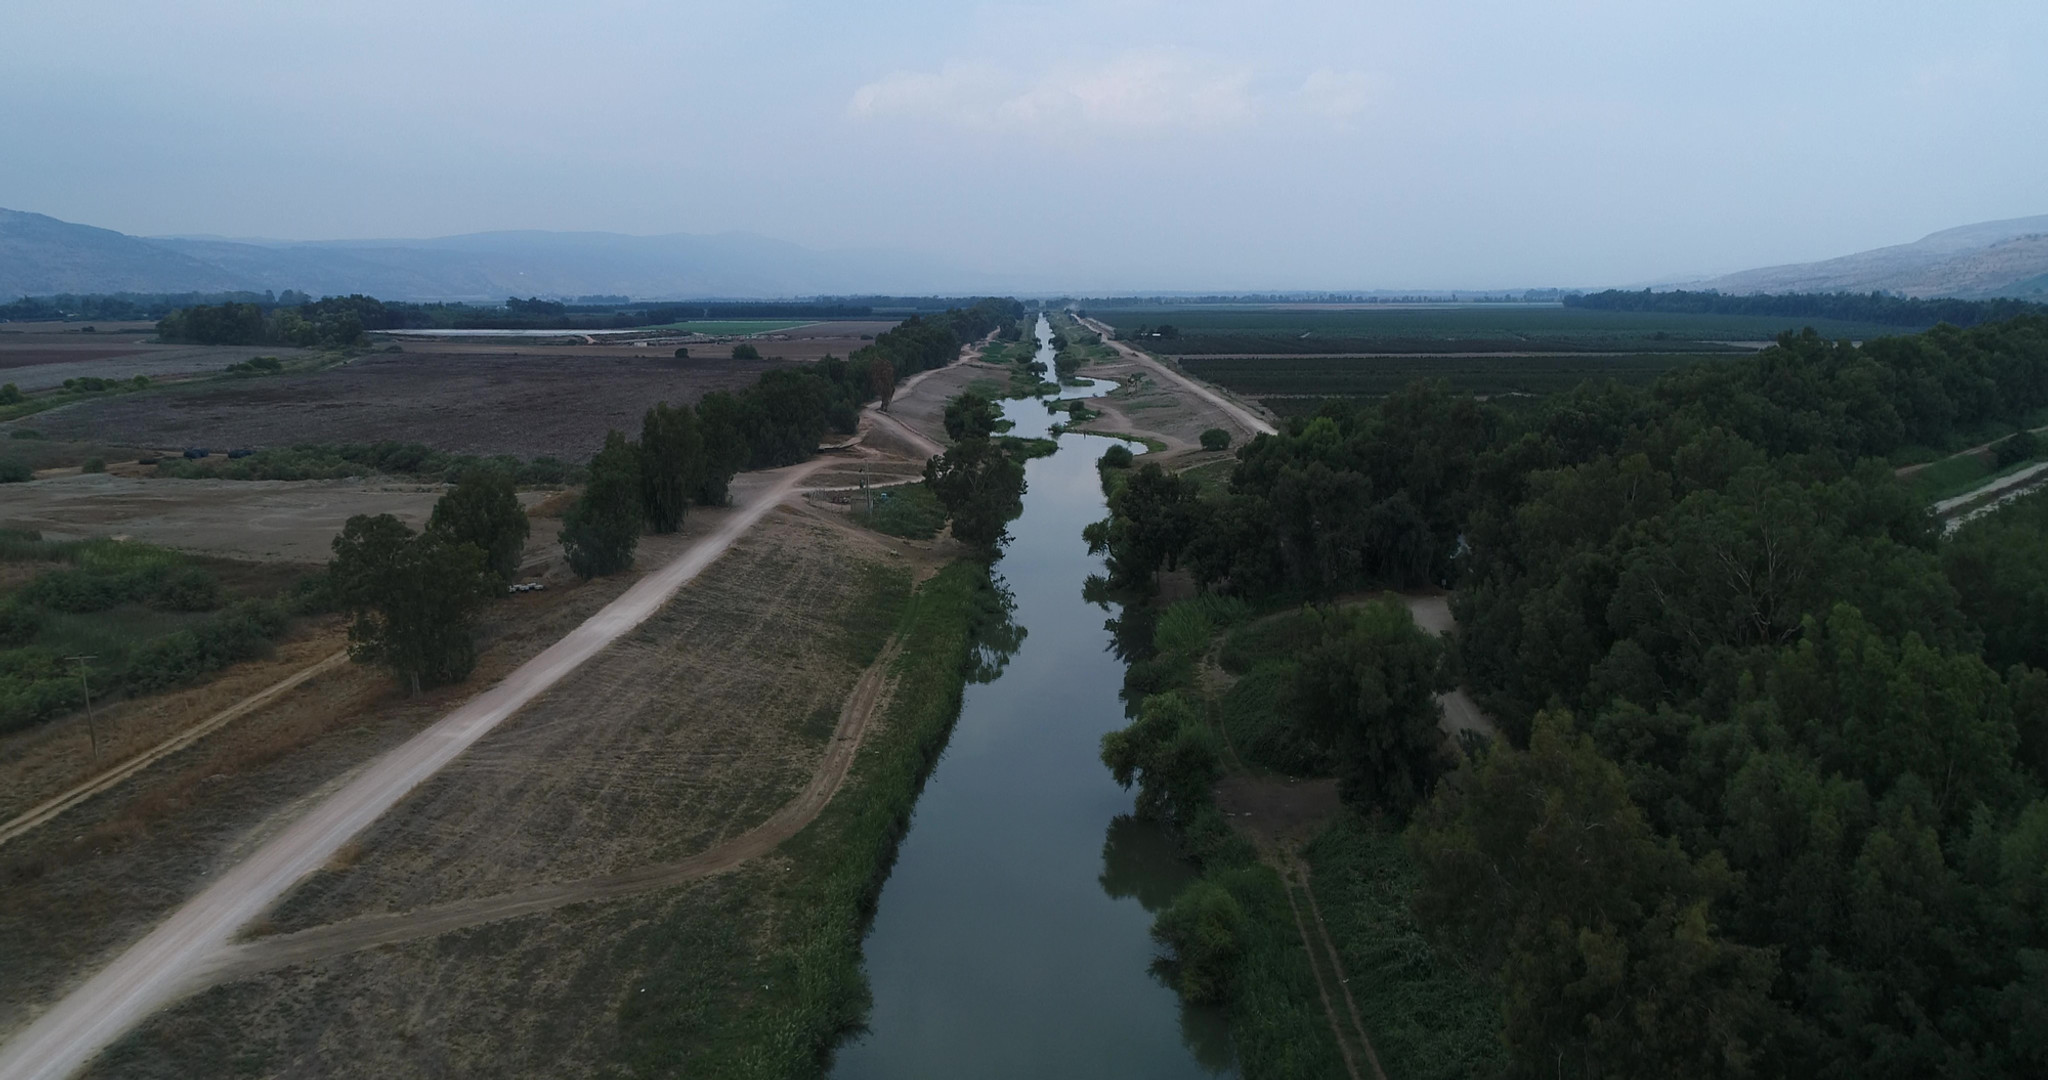 Jordan River by Viewing Area 2